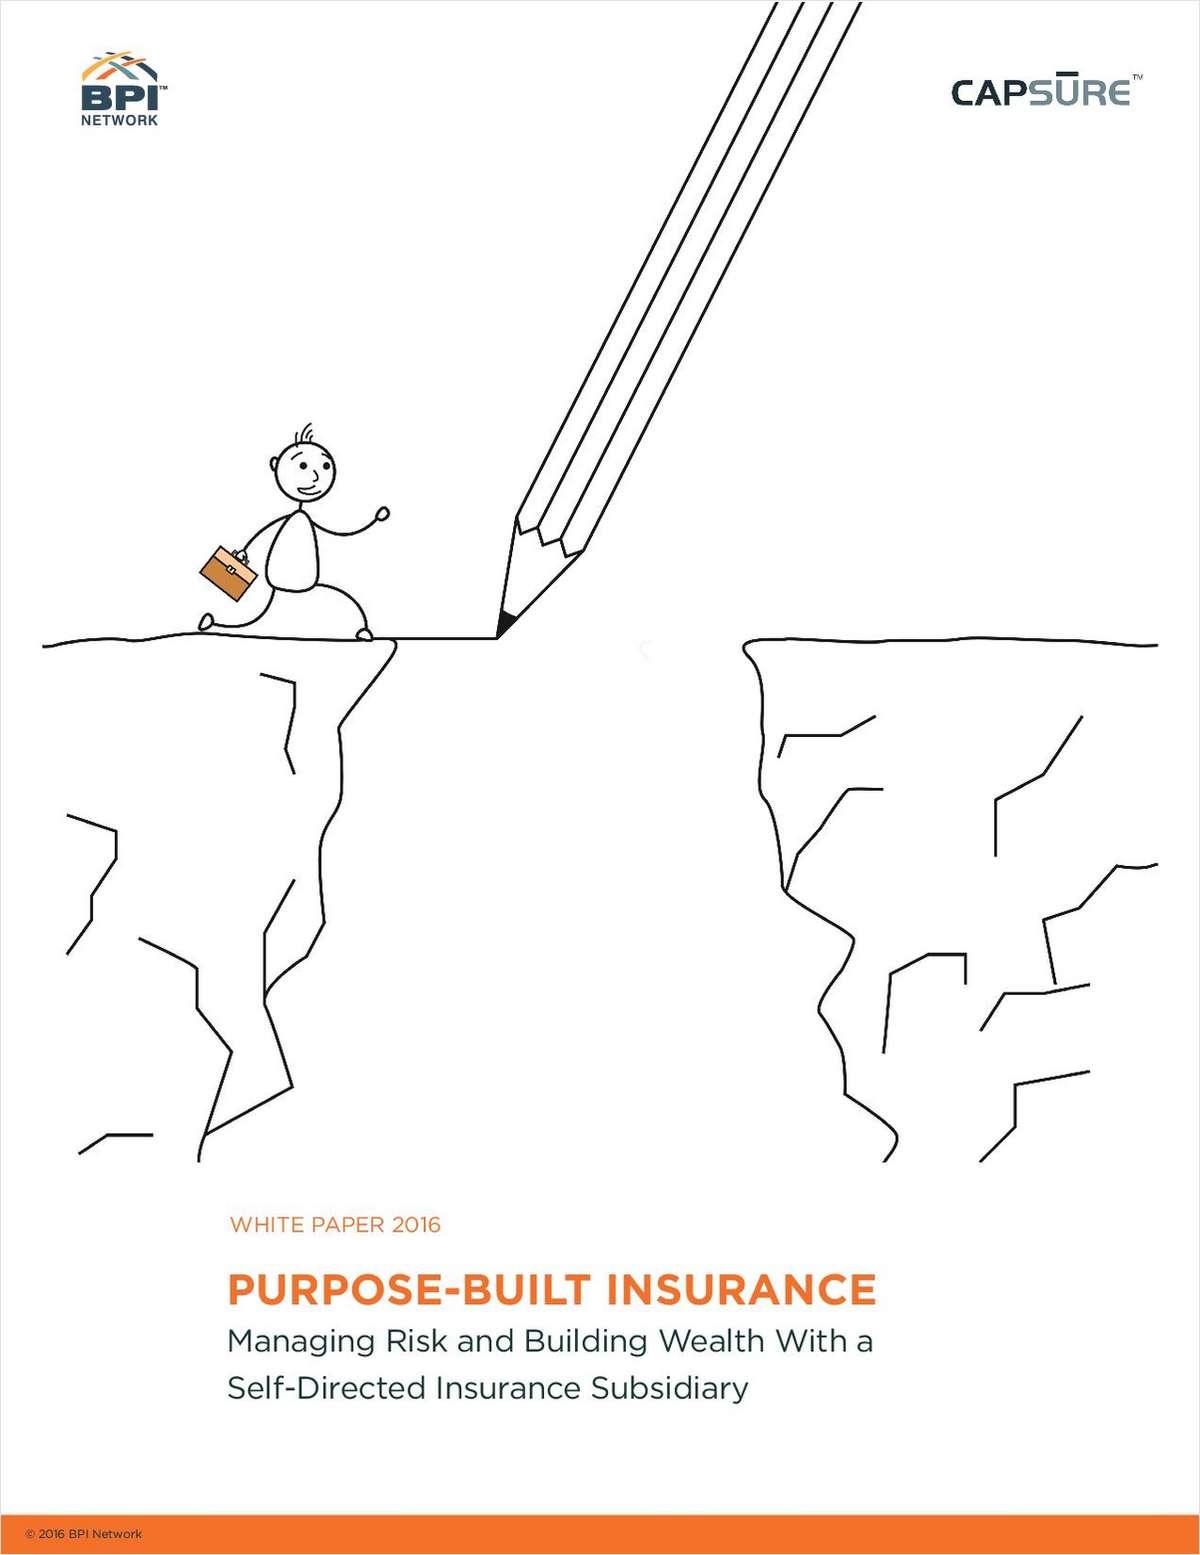 Purpose-Built Insurance